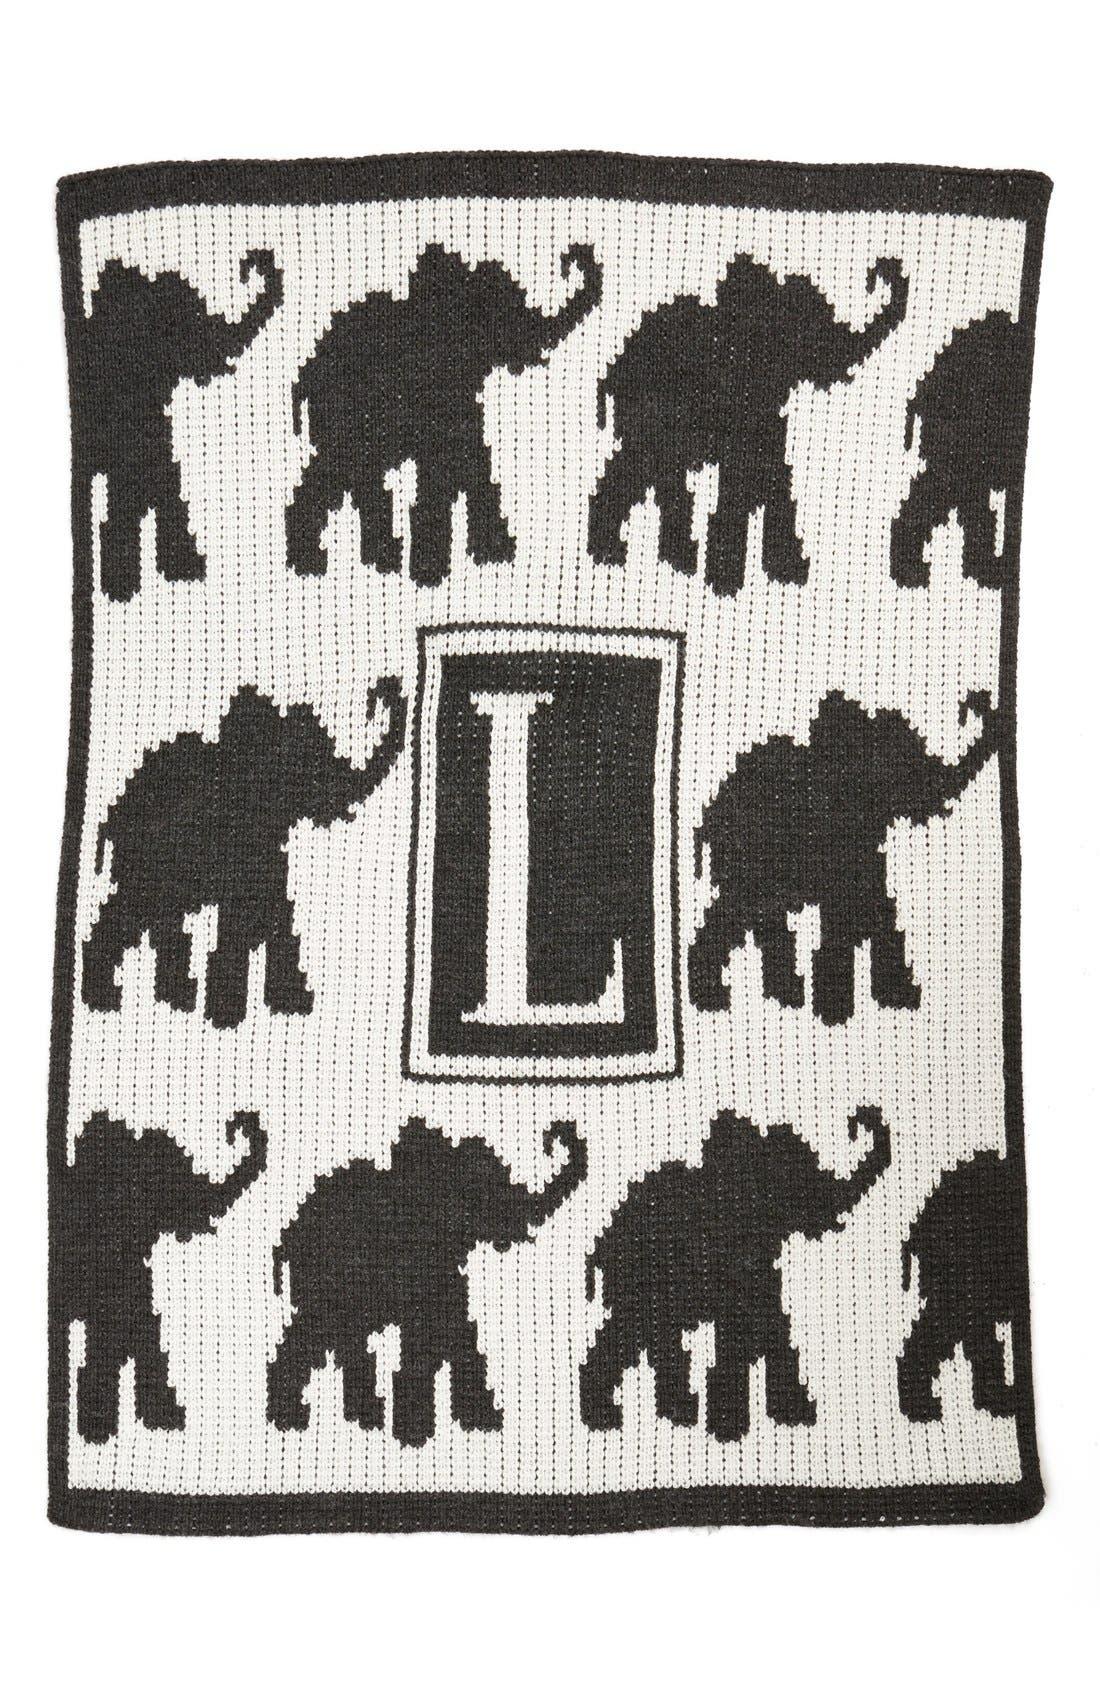 Main Image - Butterscotch Blankees 'Walking Elephants' Personalized Crib Blanket